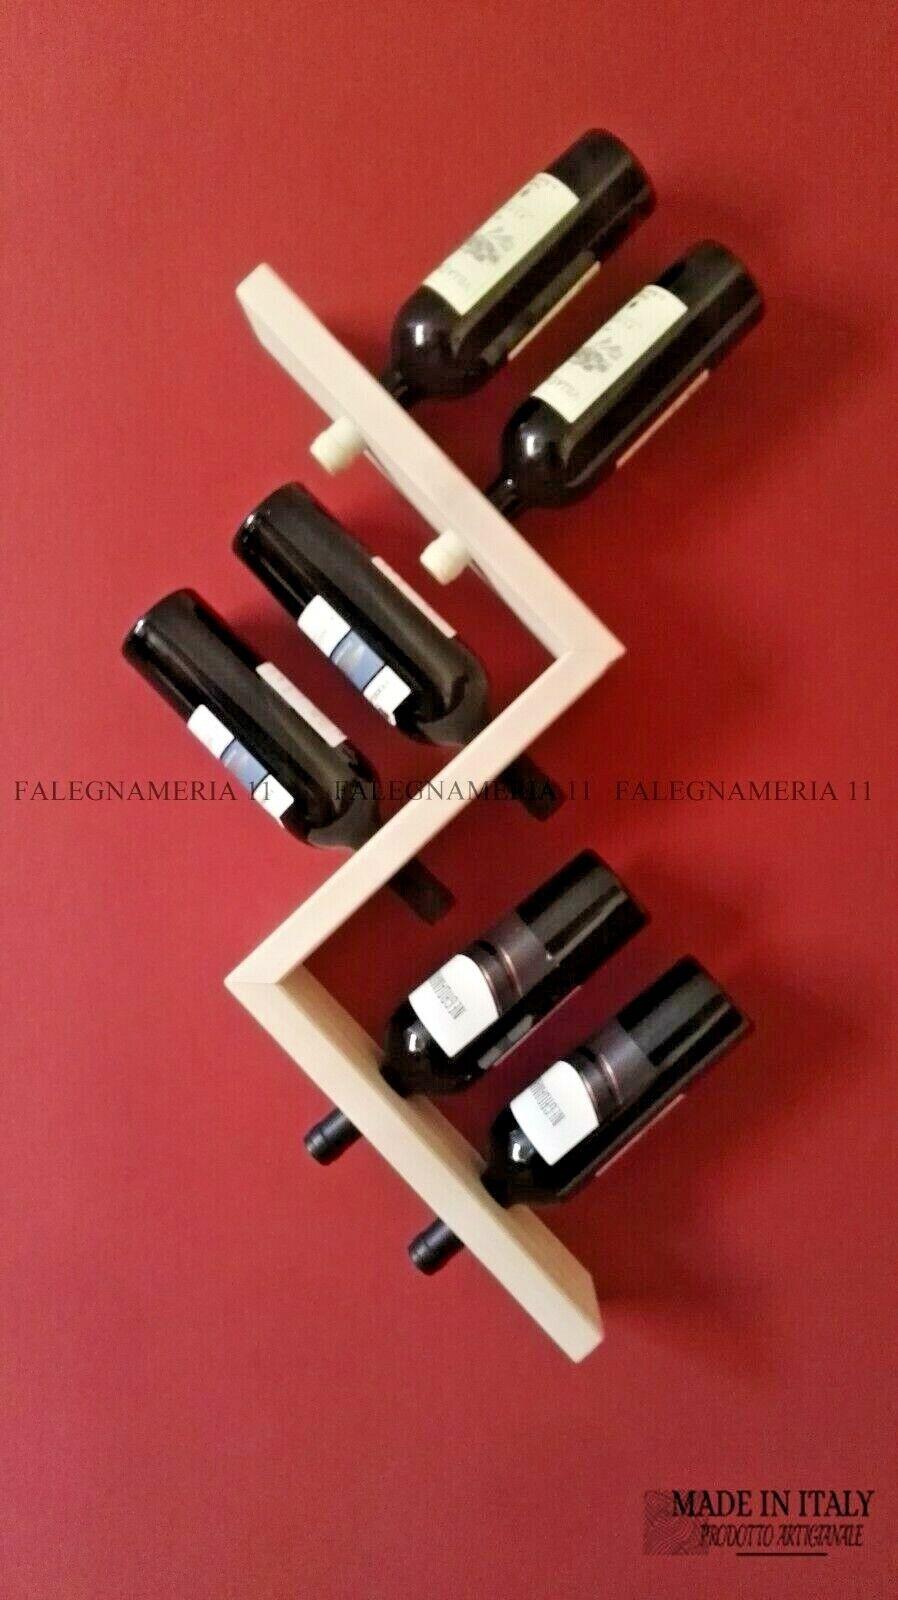 Cantinetta portabottiglie di vino in legno ABETE da parete muro porta bottiglie